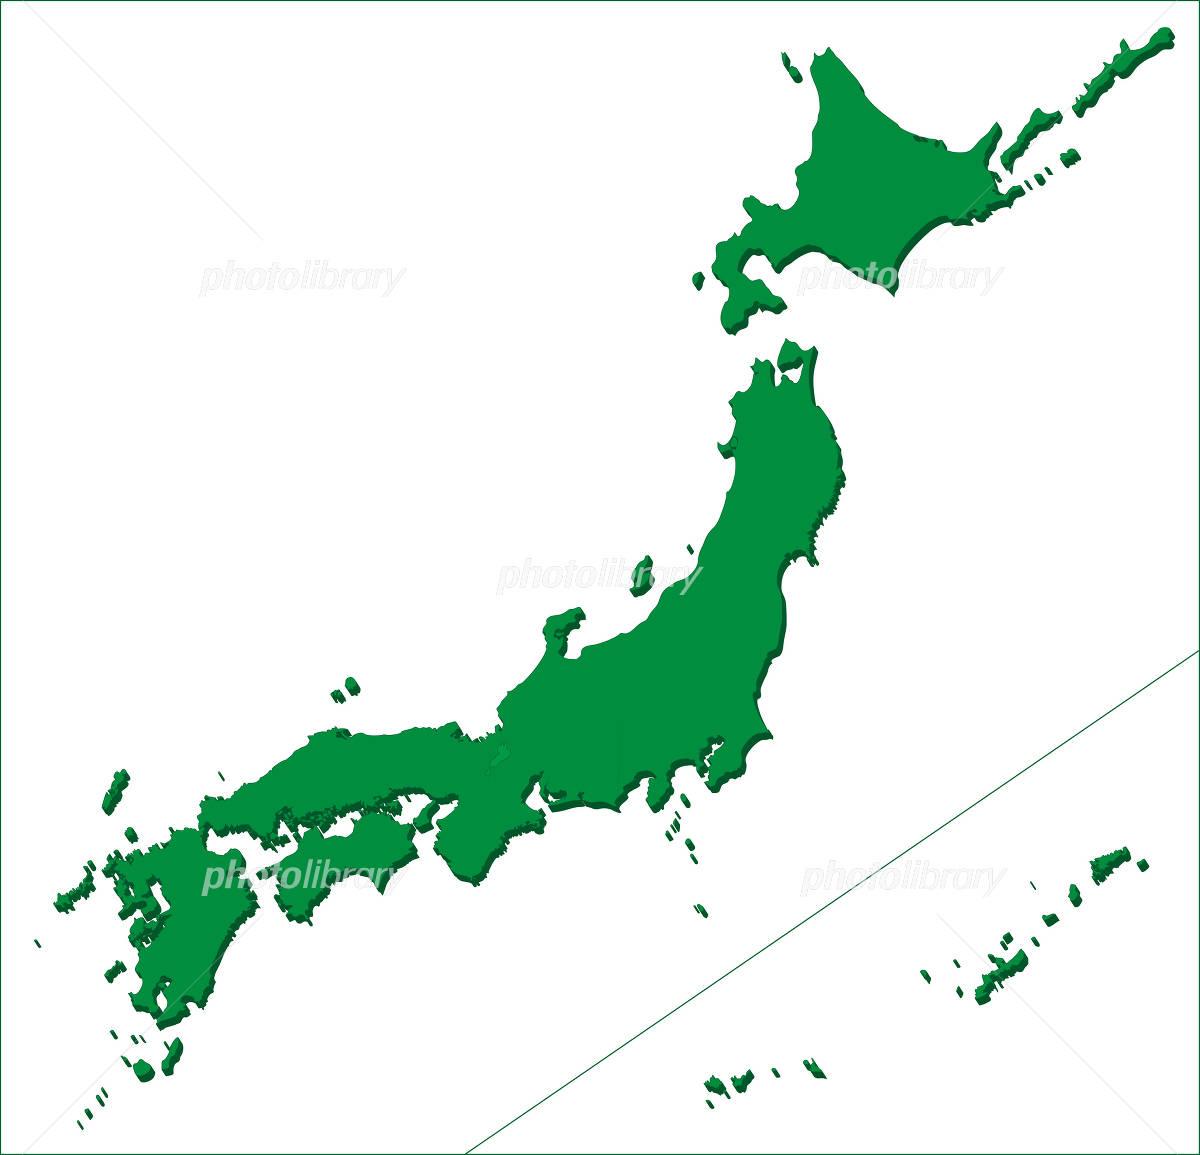 3D map of Japan イラスト素材